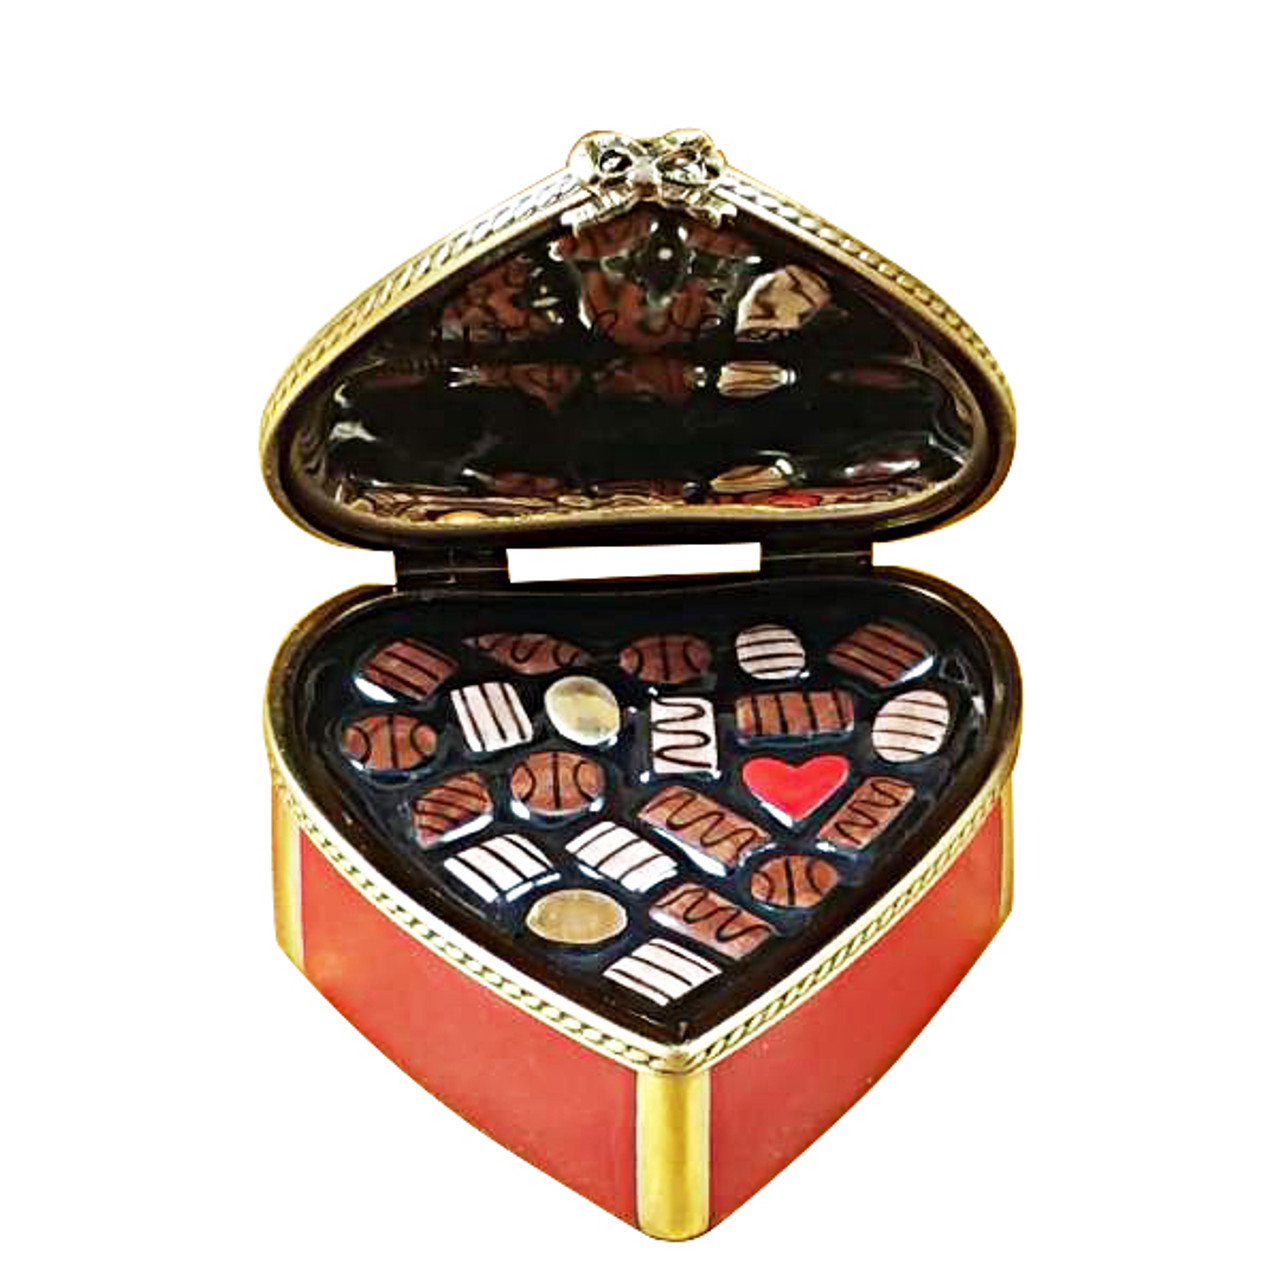 Red Heart W/Chocolates Rochard Limoges Box